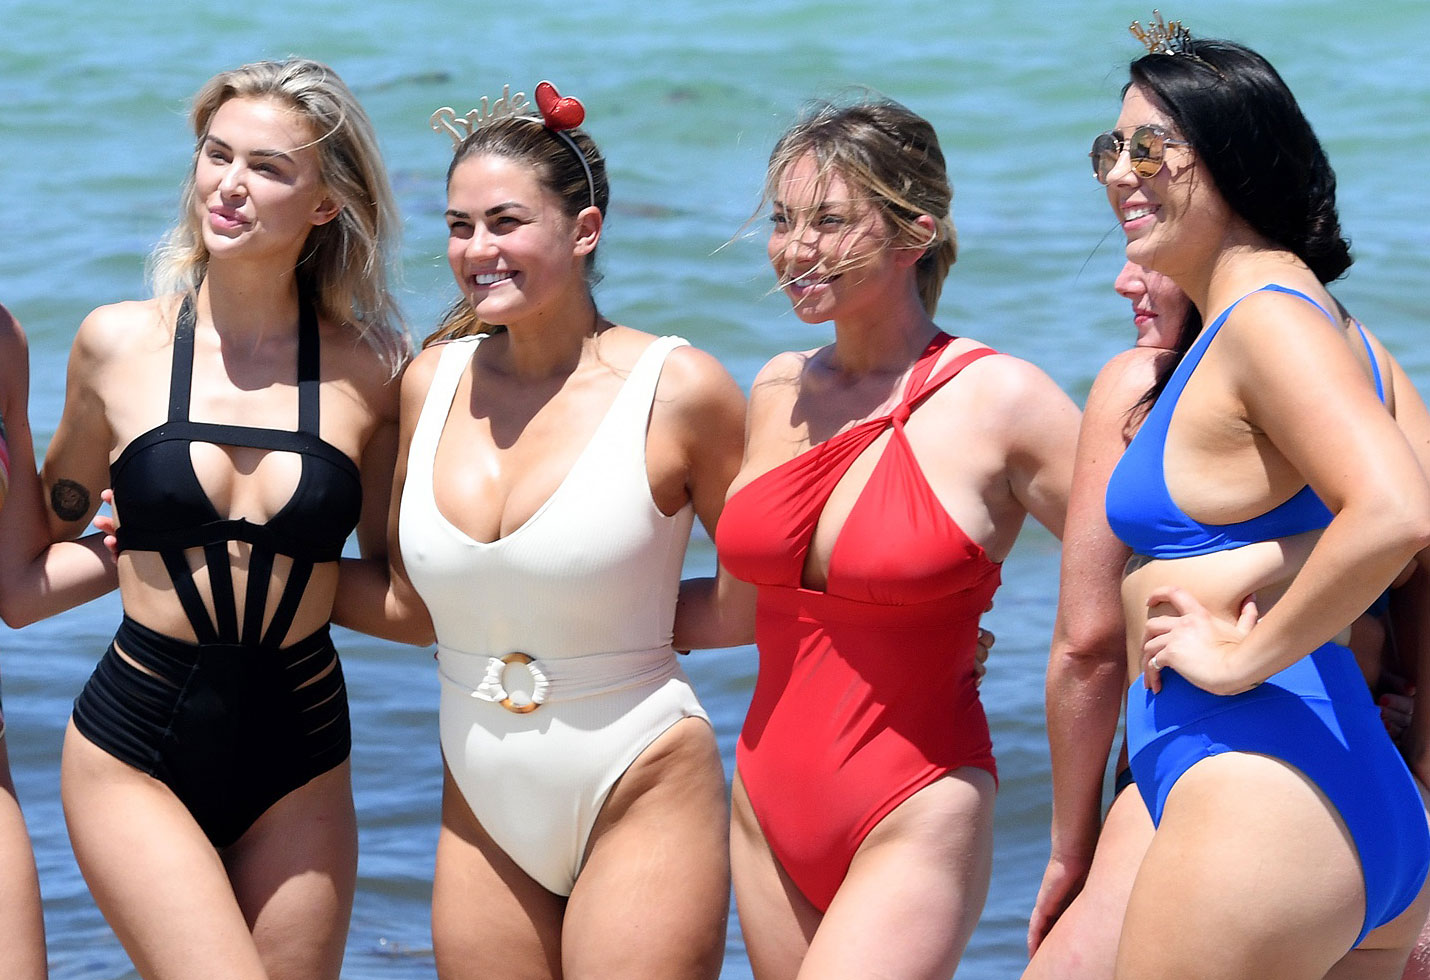 Vpr brittany cartwright bachelorette lala kent bikinis